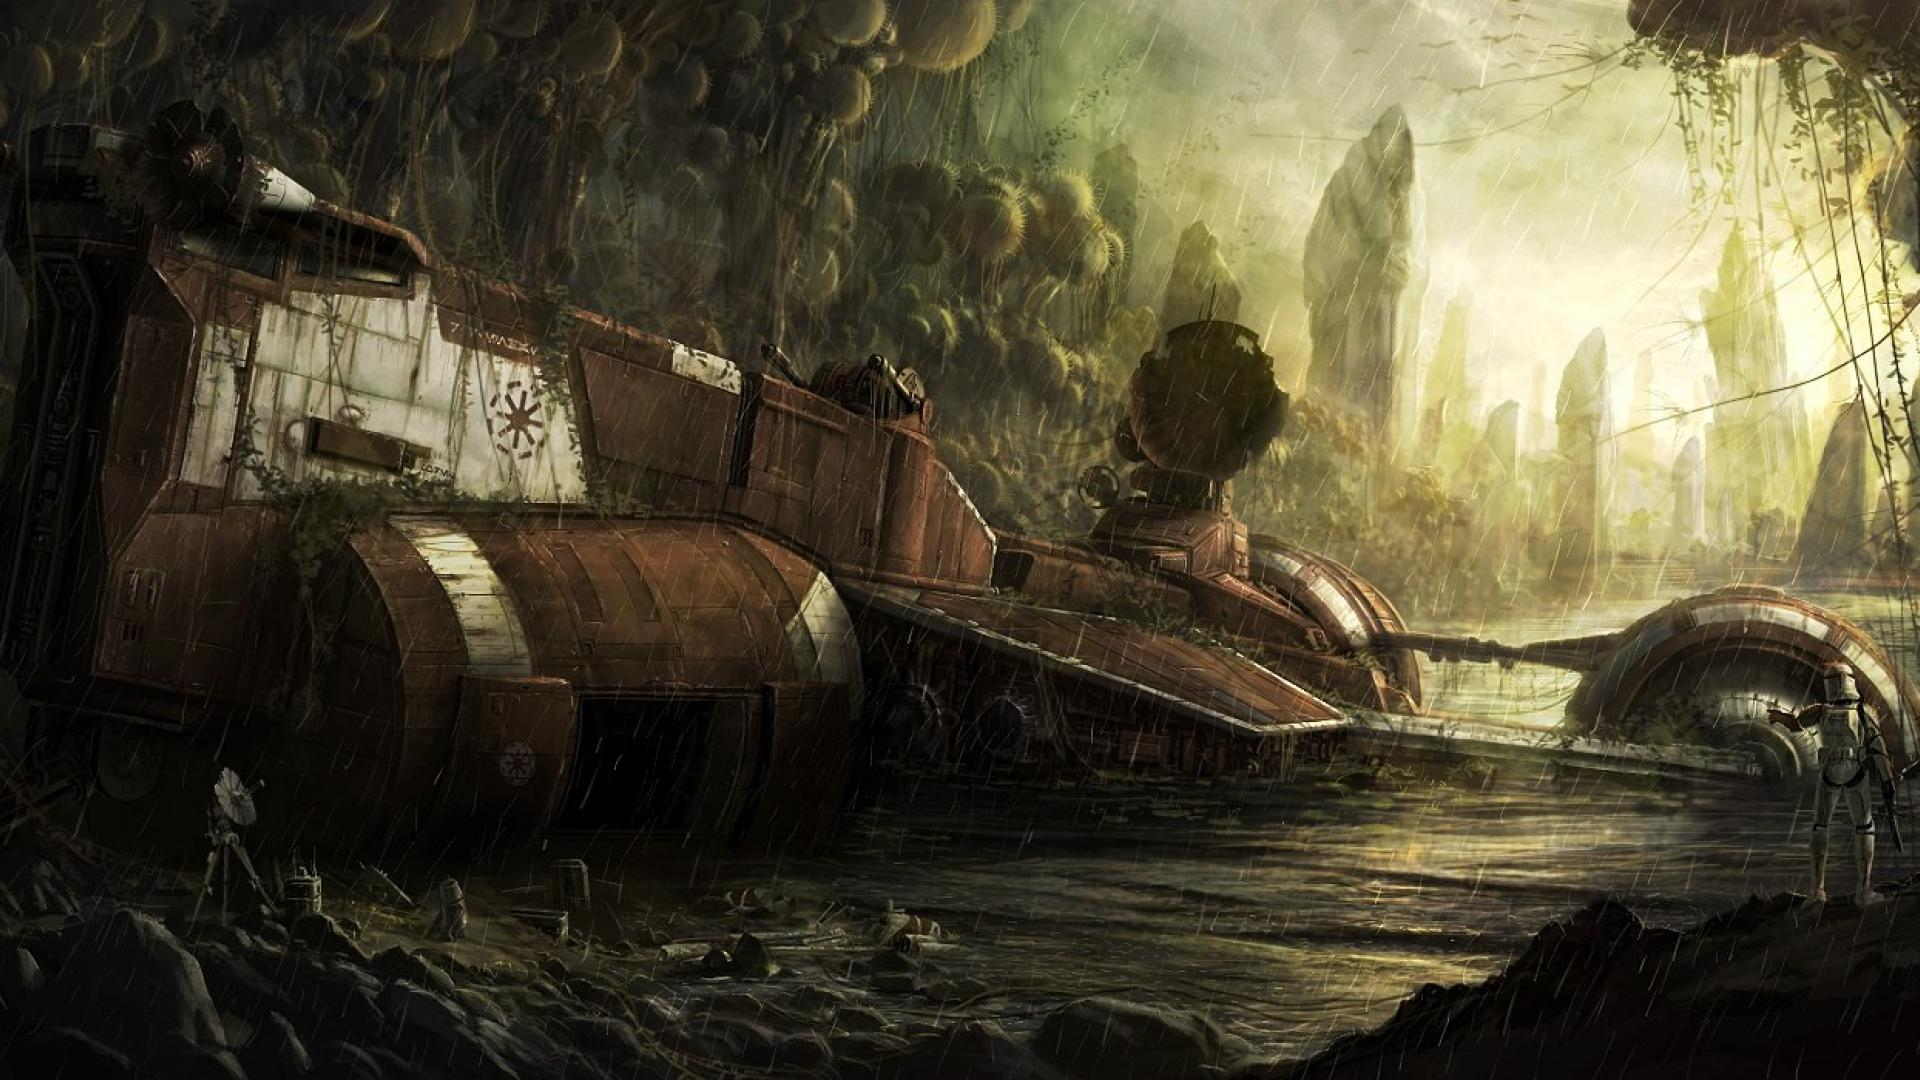 Star Wars Ships Wallpapers - Wallpaper Cave